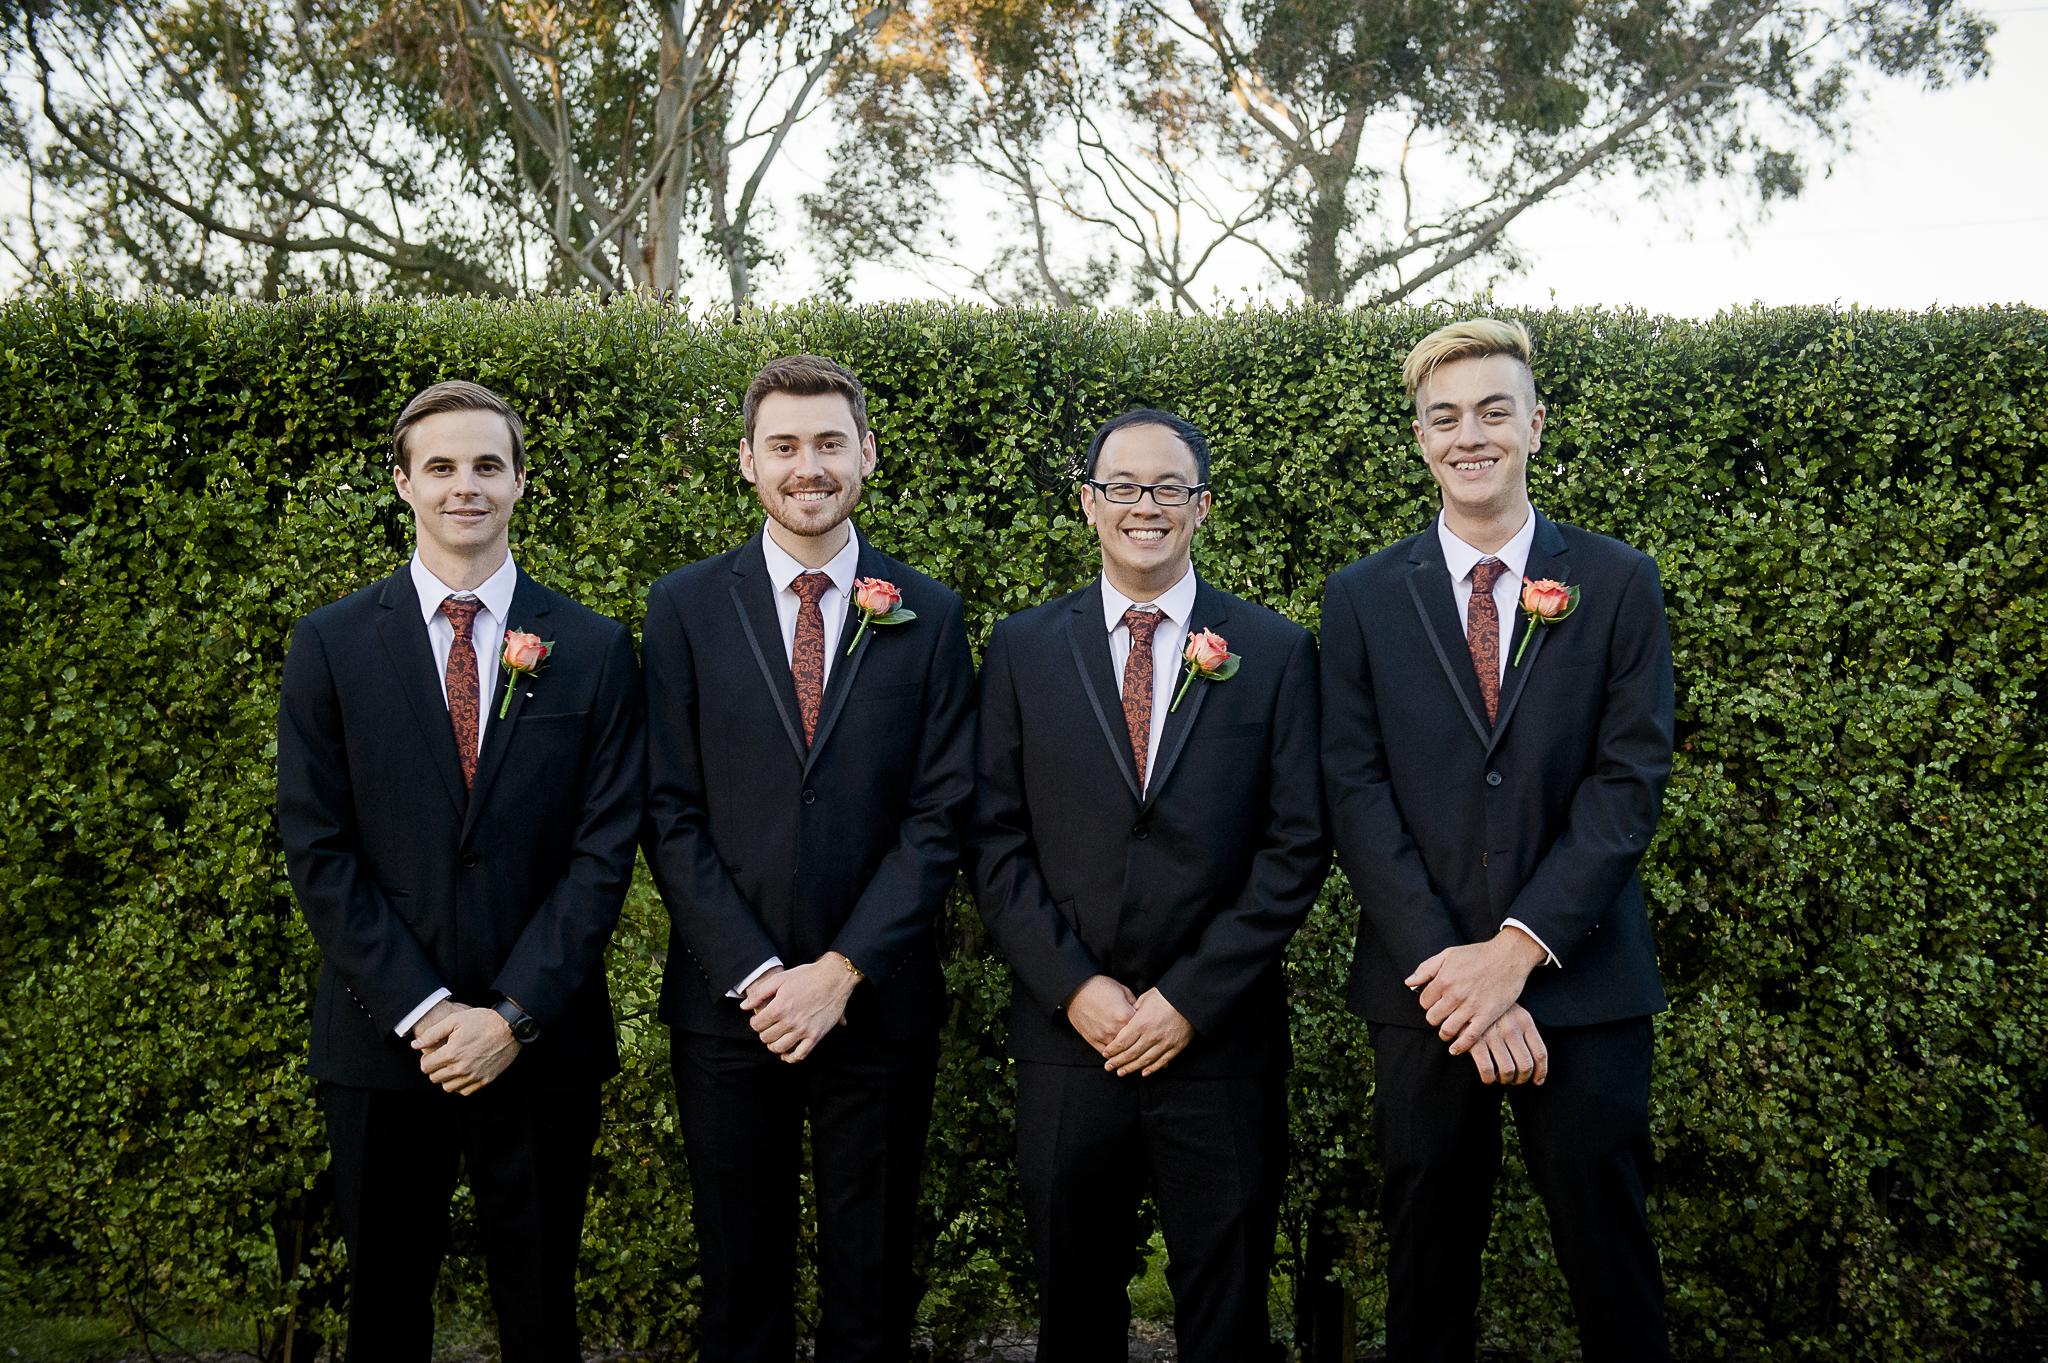 Wedding photography Melbourne Macedon Ranges